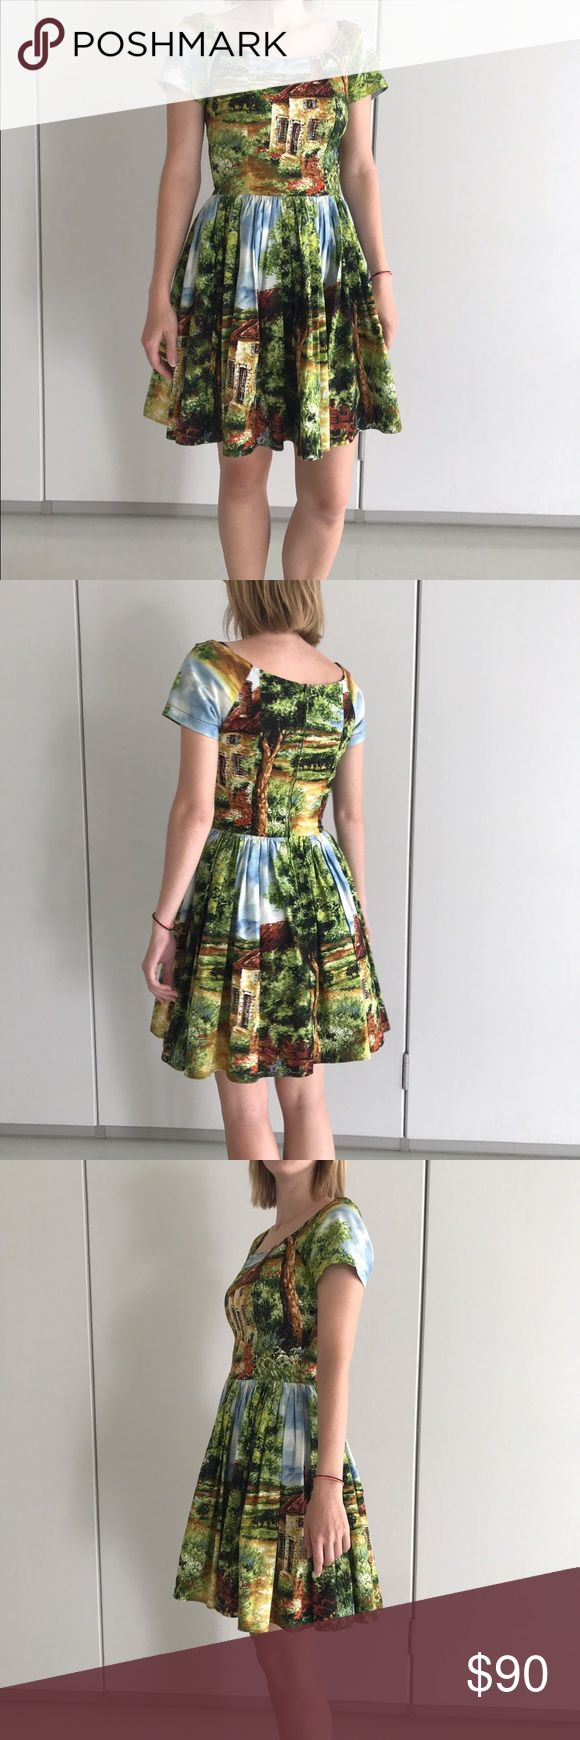 Selling this Bernie dexter cottage print dress *with pockets!* on Poshmark! My username is: chrshevlin. #shopmycloset #poshmark #fashion #shopping #style #forsale #bernie dexter #Dresses & Skirts